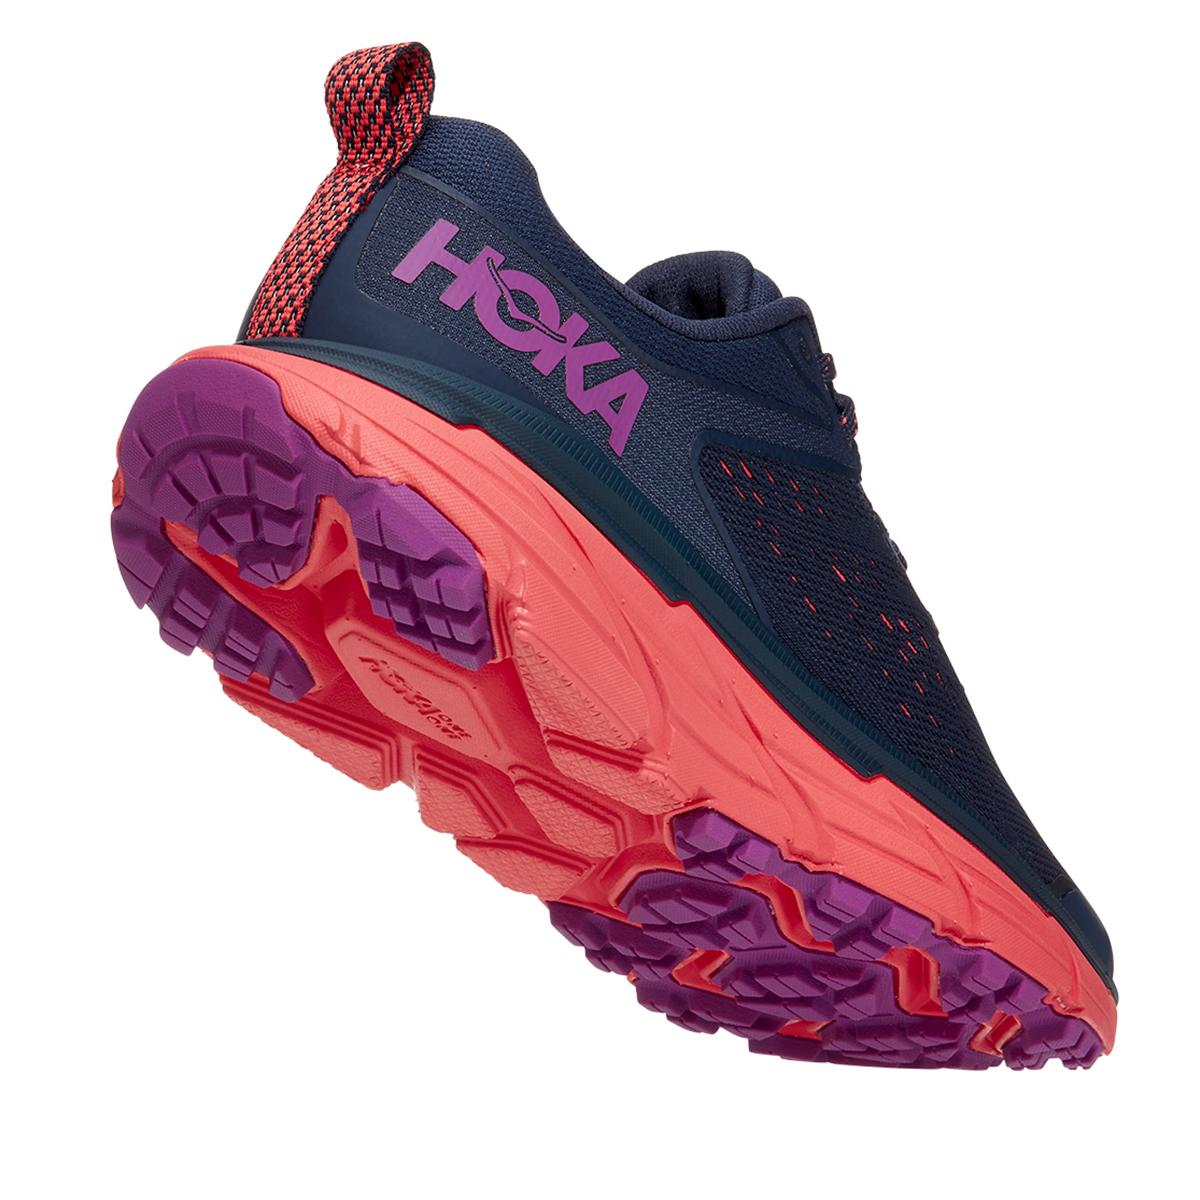 Women's Hoka One One Challenger ATR 6 Running Shoe - Color: Black Iris/Hot Coral - Size: 5 - Width: Regular, Black Iris/Hot Coral, large, image 3